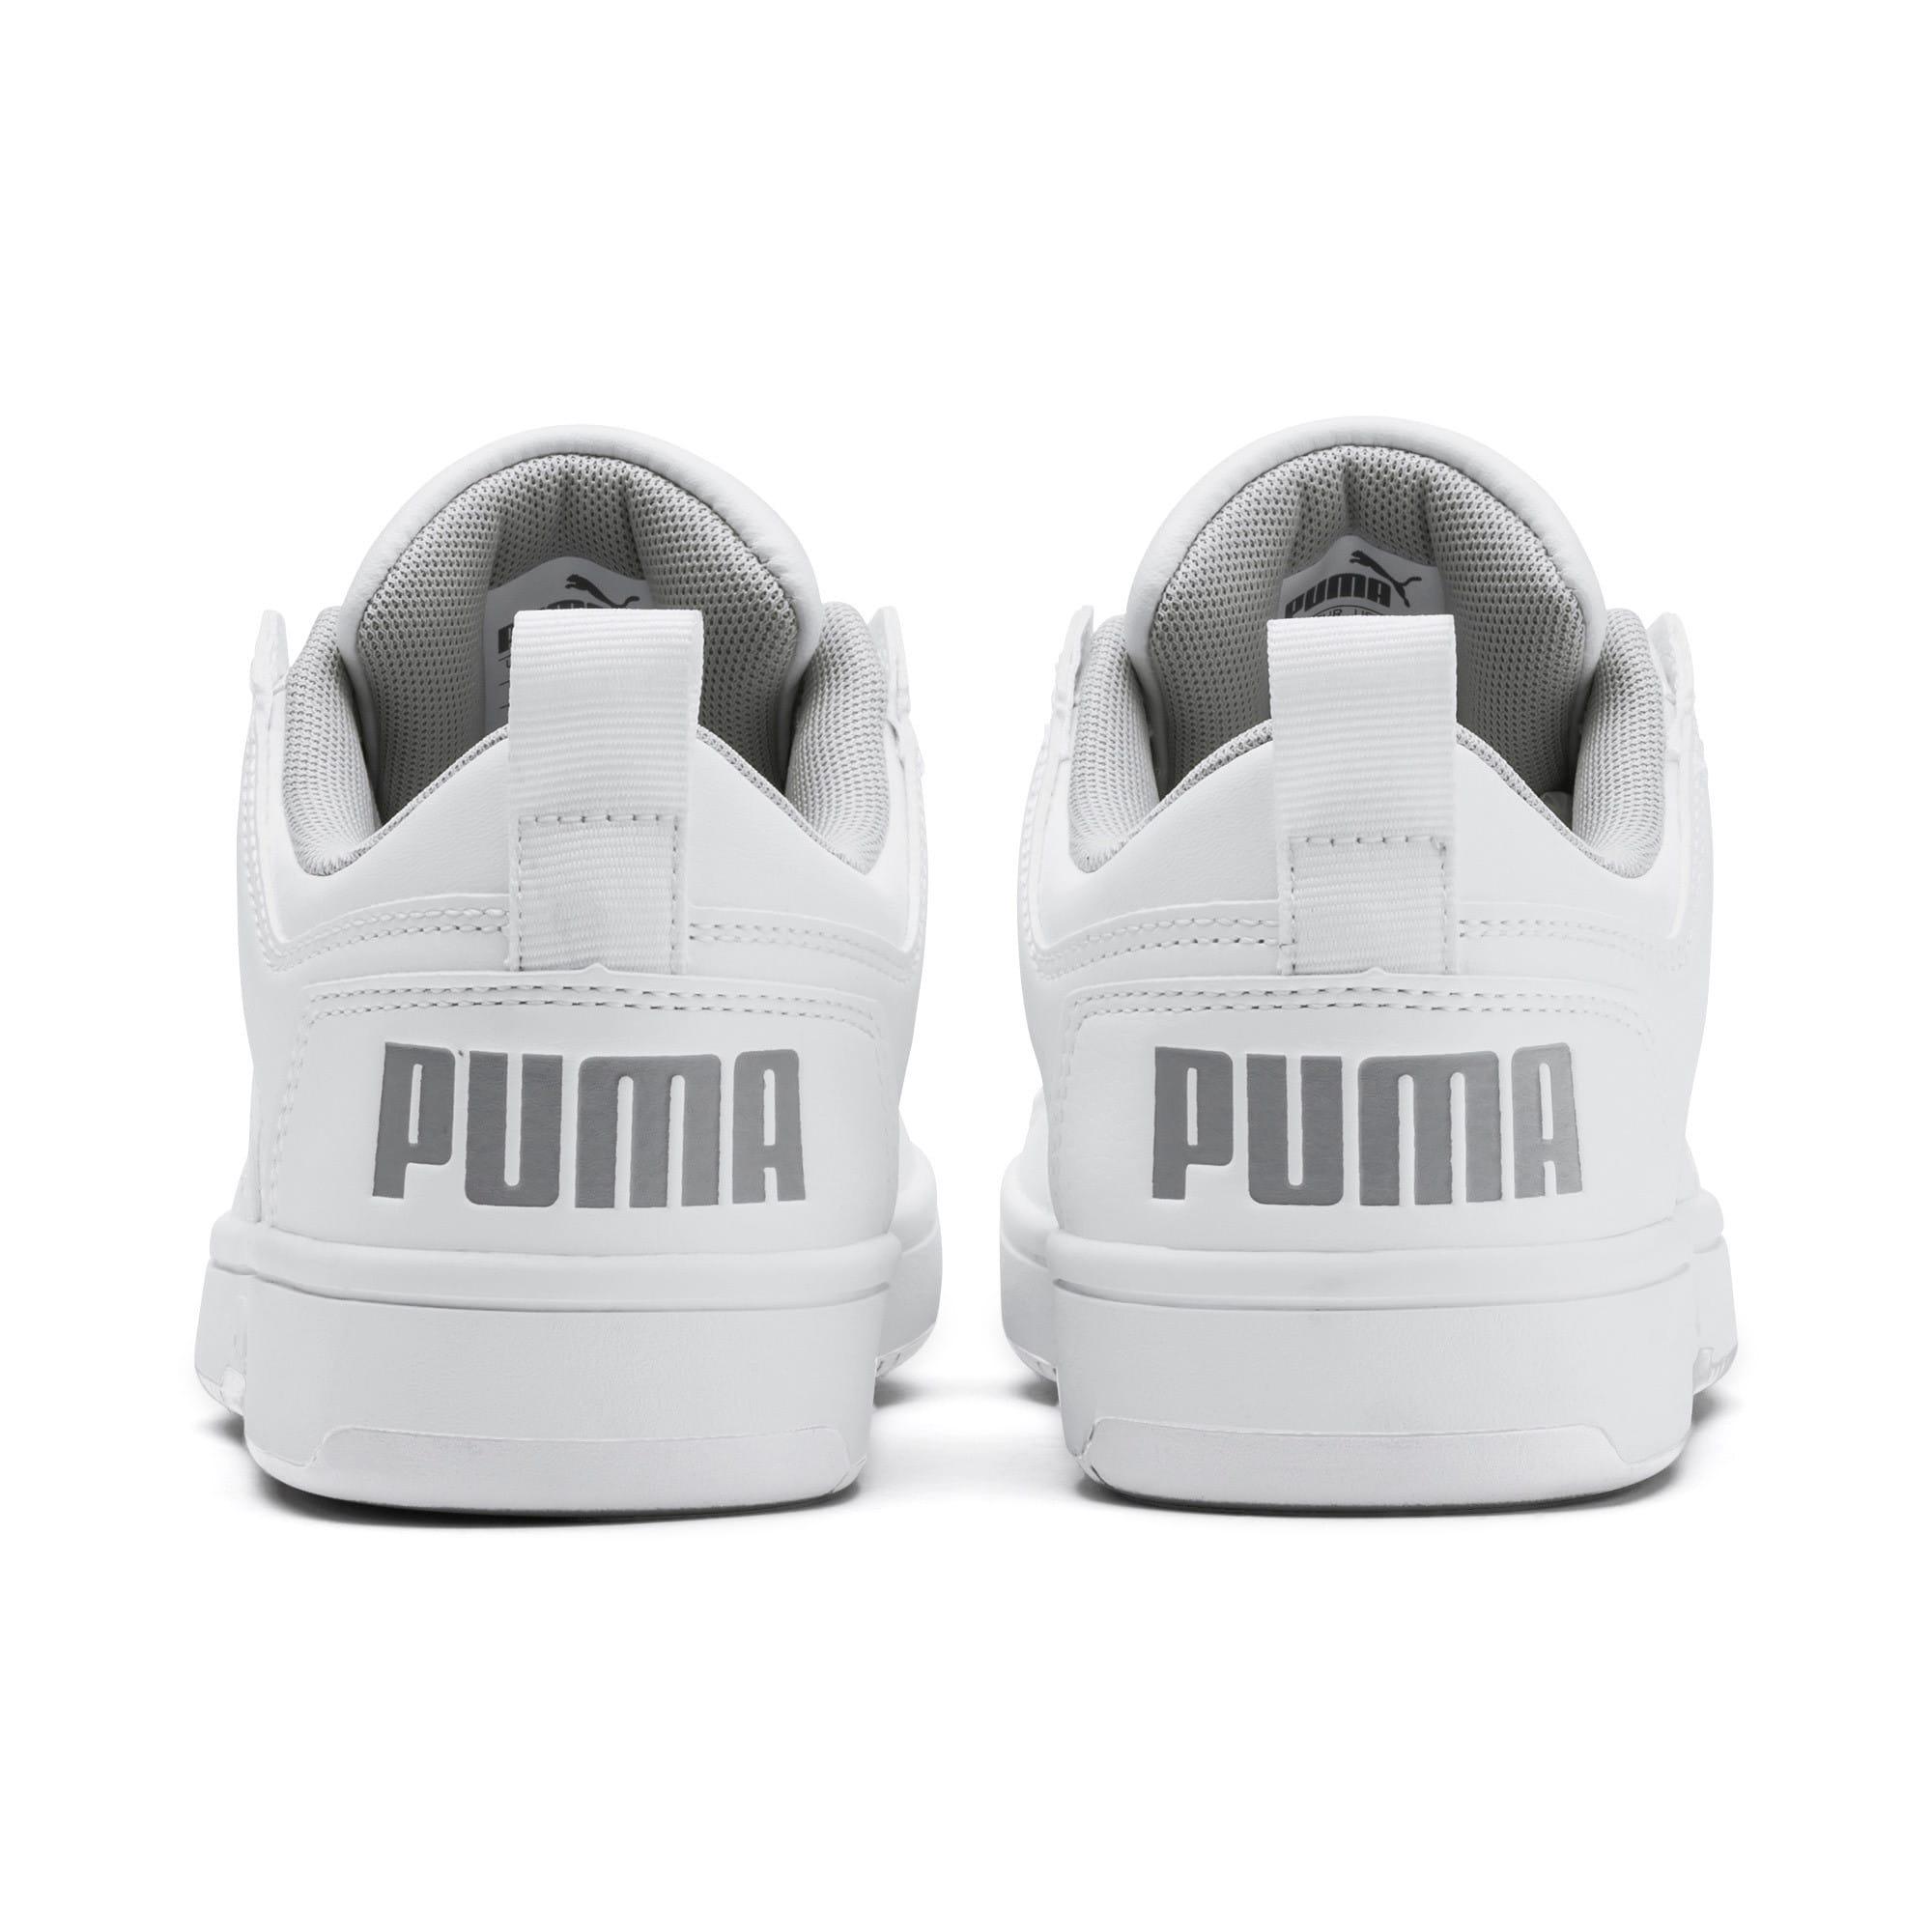 Thumbnail 3 of PUMA Rebound LayUp Lo Sneakers JR, Puma White-High Rise, medium